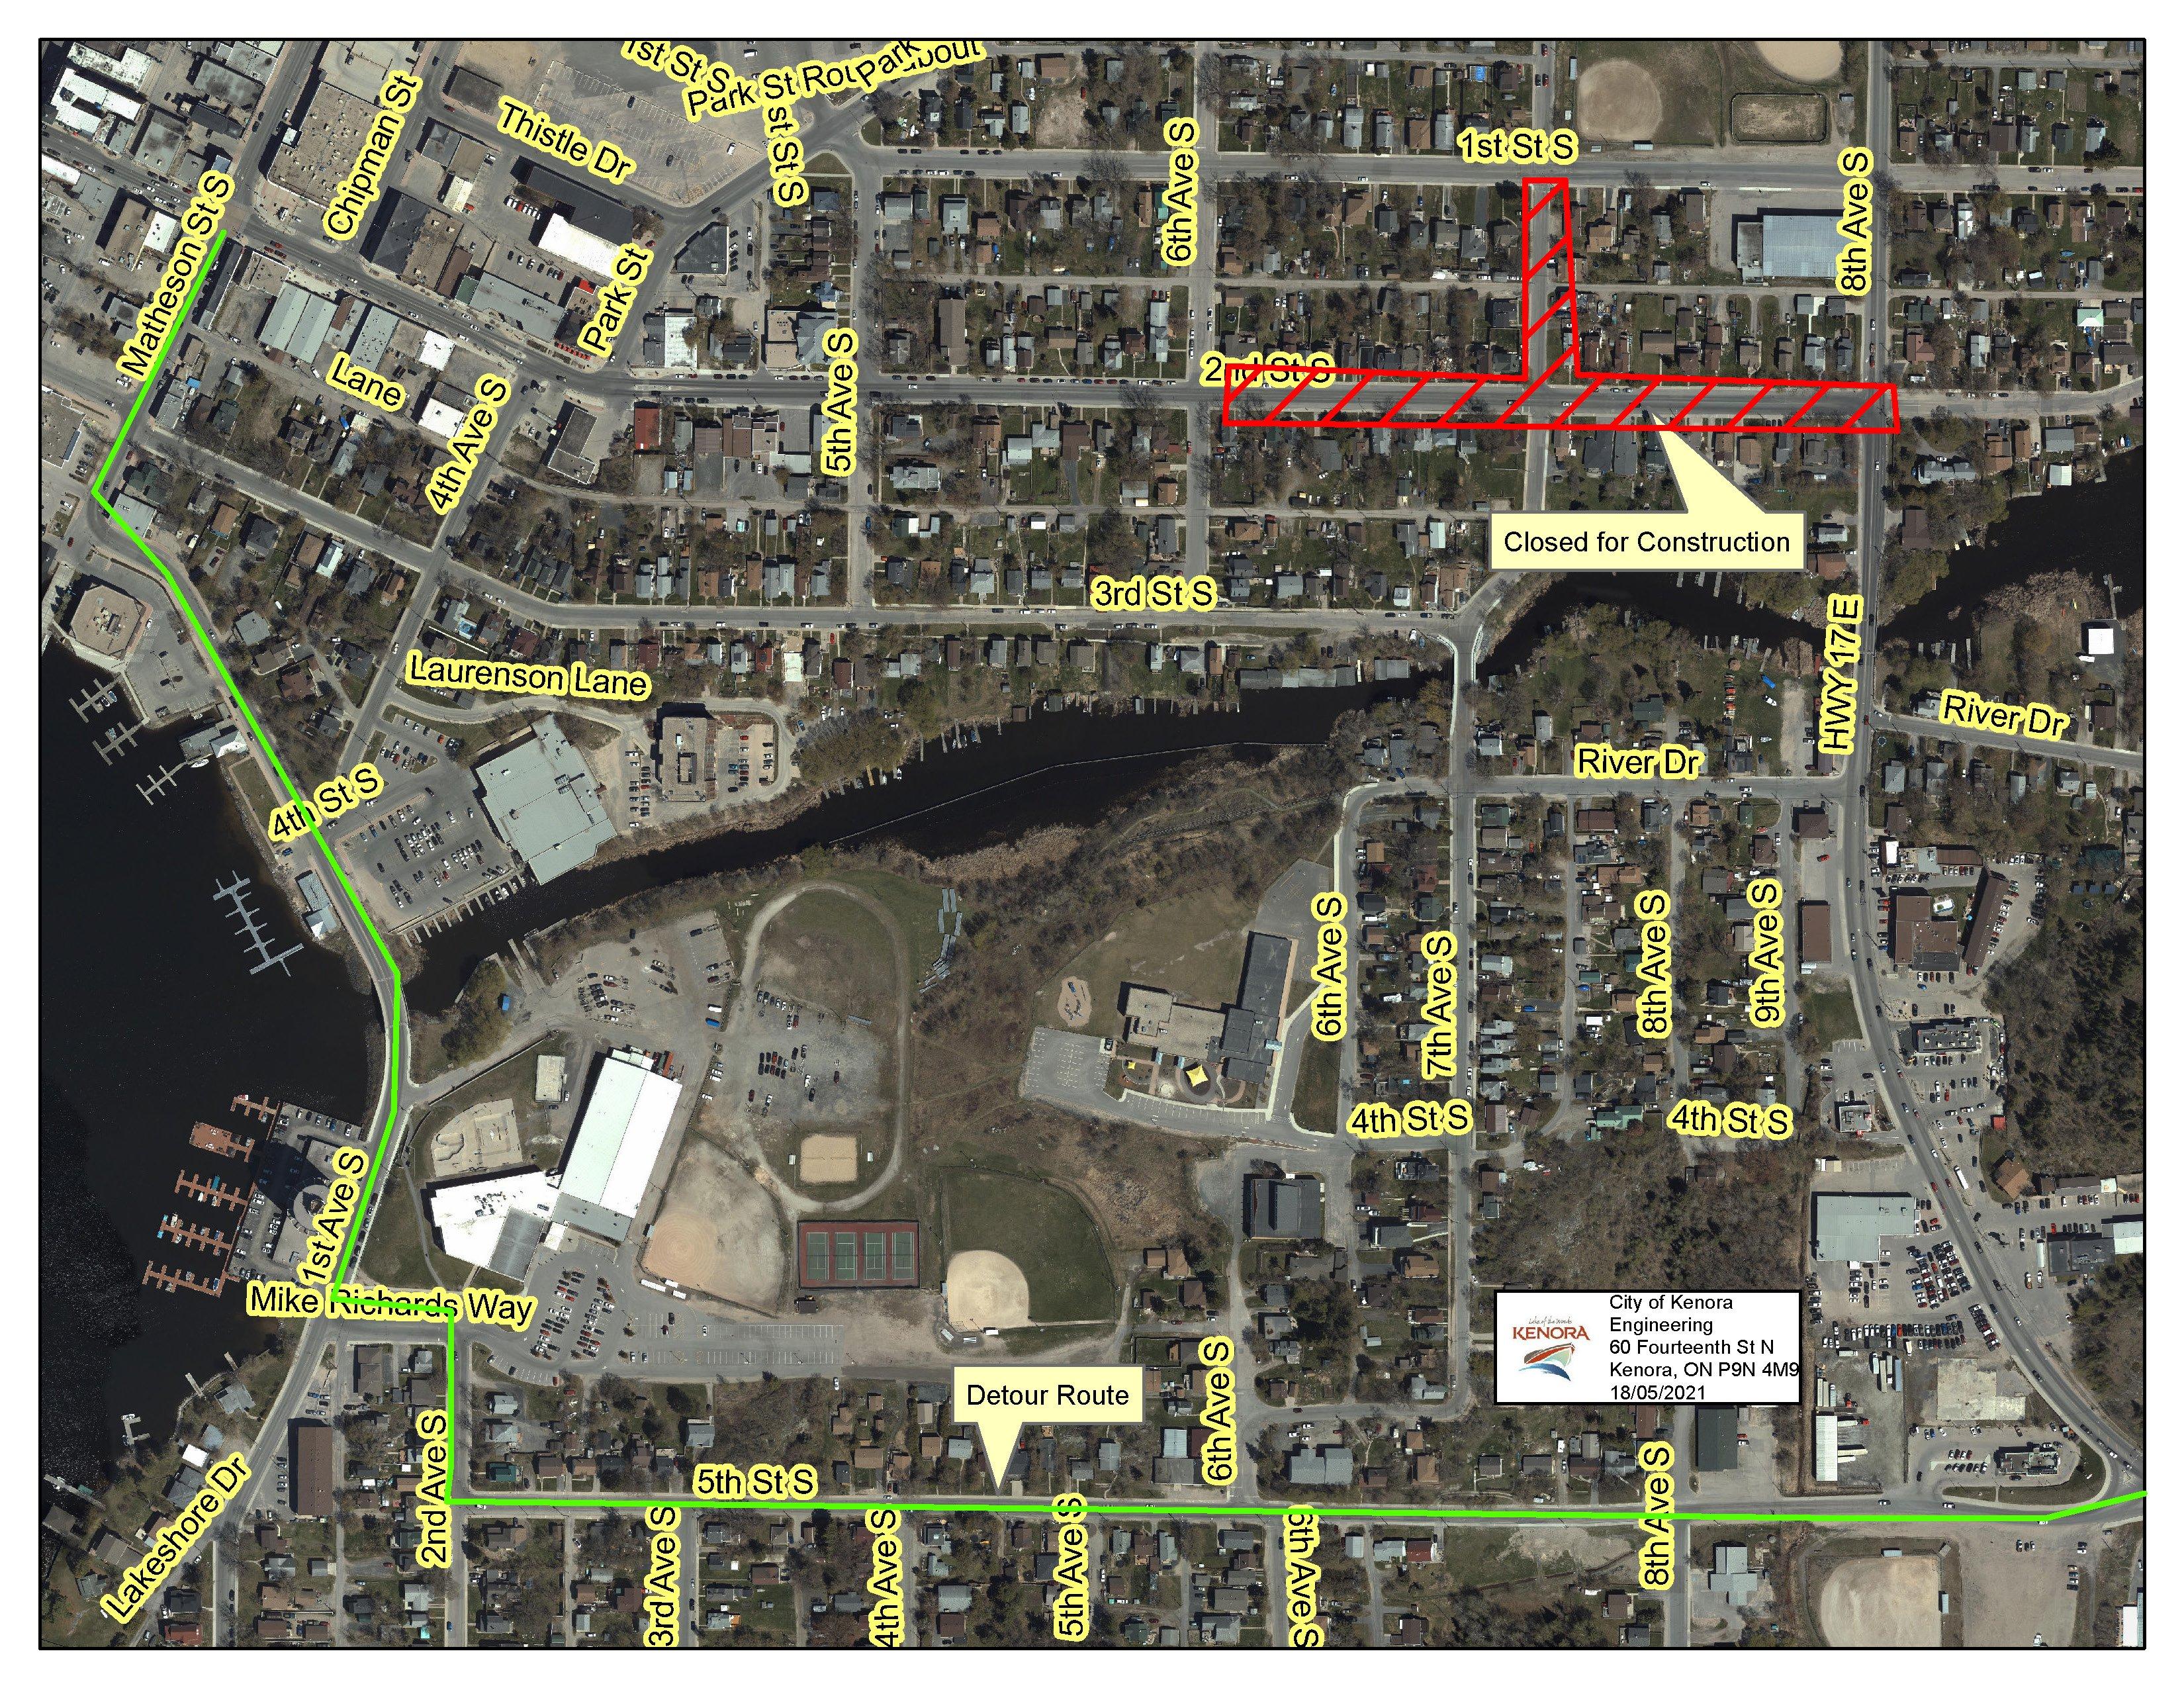 aerial view of road closure area